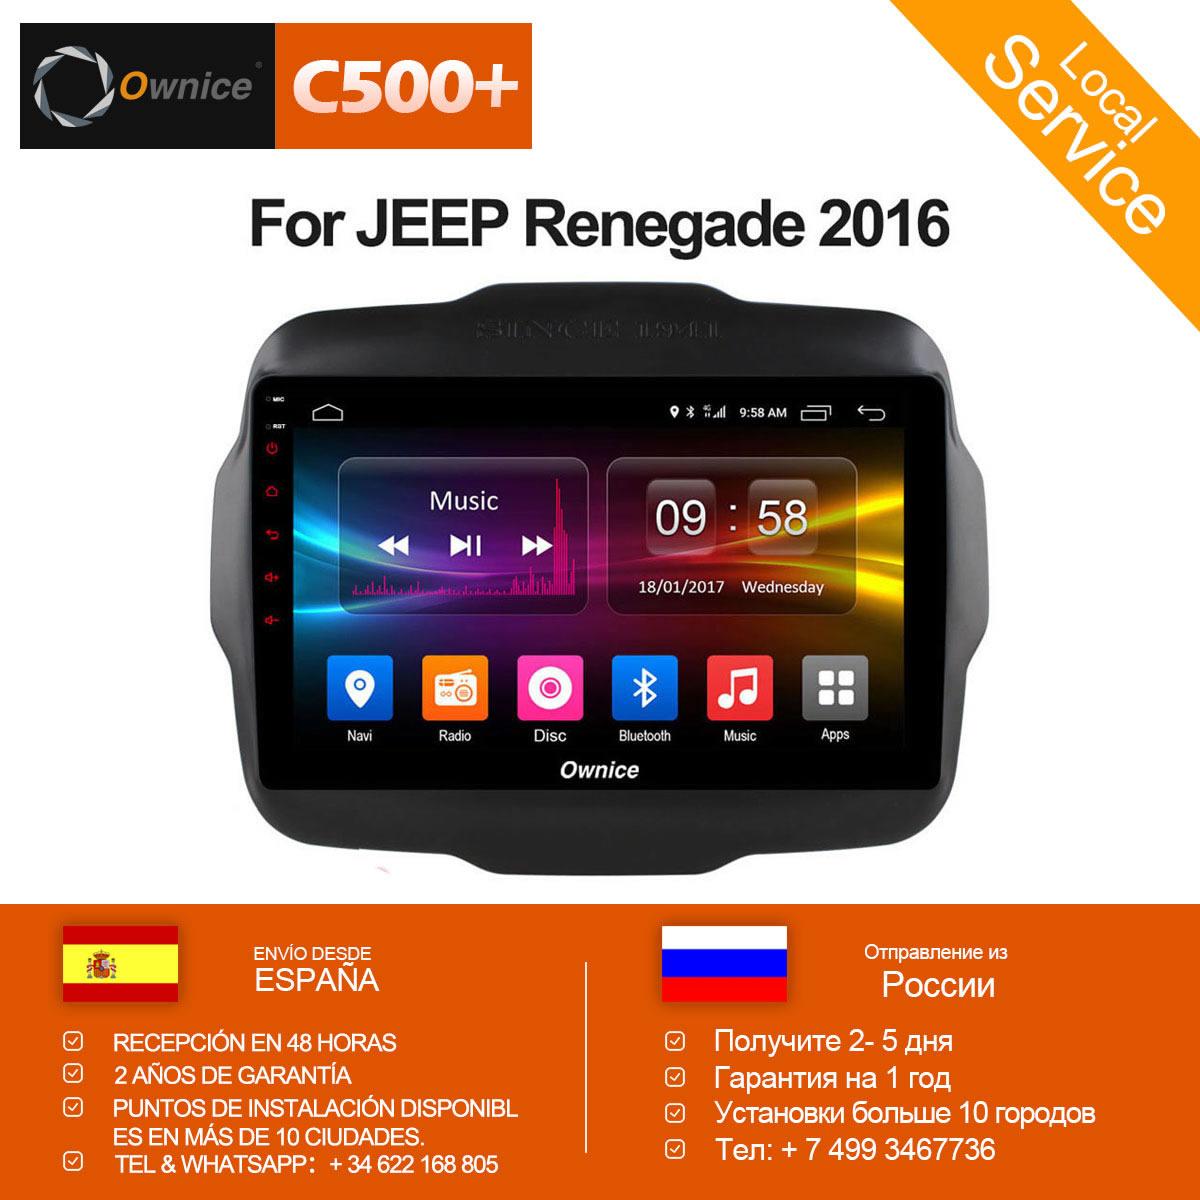 Ownice C500 + G10 אנדרואיד 8.1 שמונה Core עבור JEEP Renegade 2016 רכב רדיו GPS Navi נגן תמיכה 4 גרם 2 gb RAM 32 gb ROM 4 גרם LTE